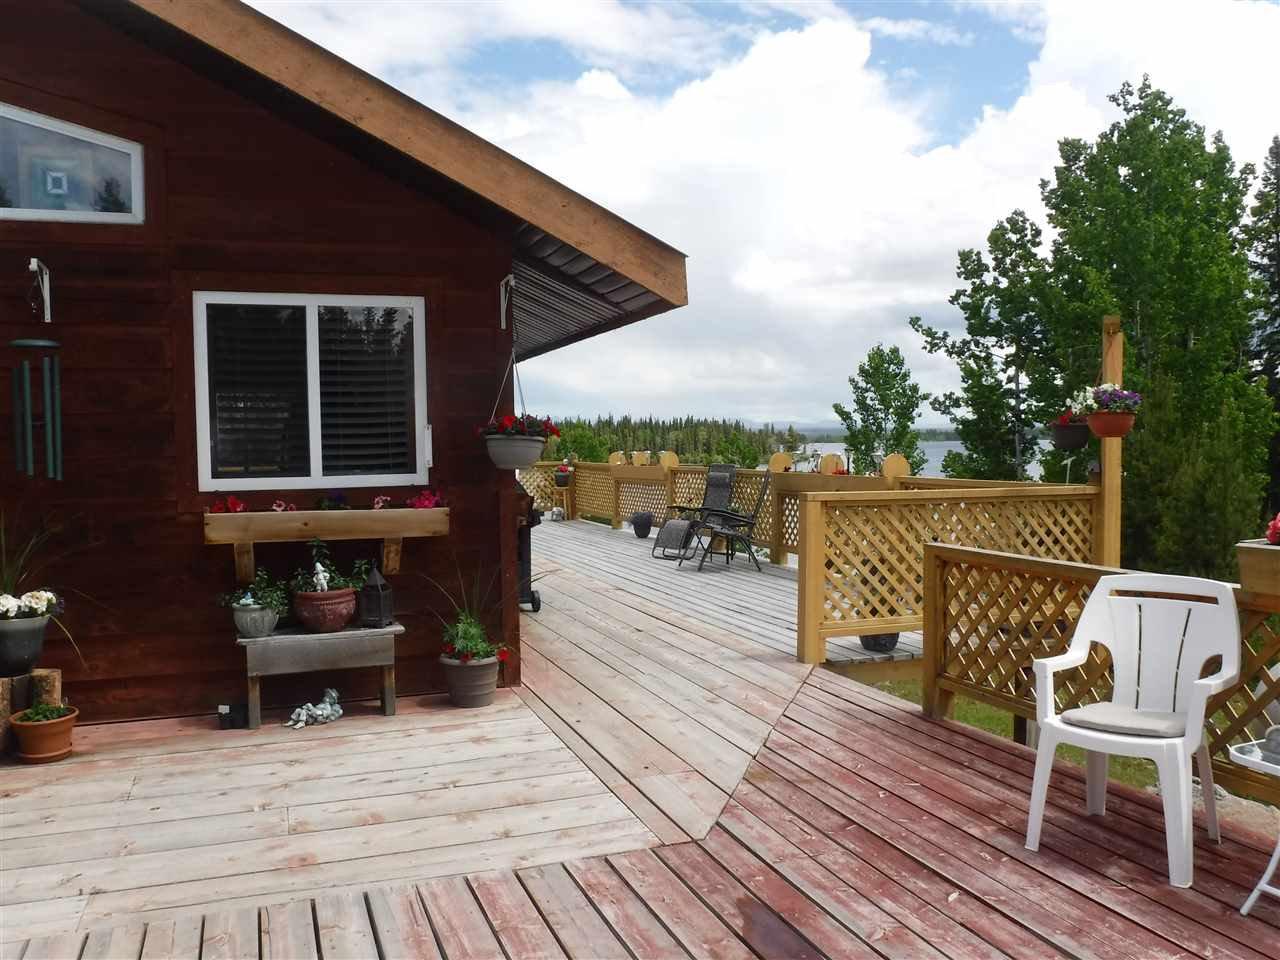 Photo 15: Photos: 3126 ELSEY Road in Williams Lake: Williams Lake - Rural West House for sale (Williams Lake (Zone 27))  : MLS®# R2467730